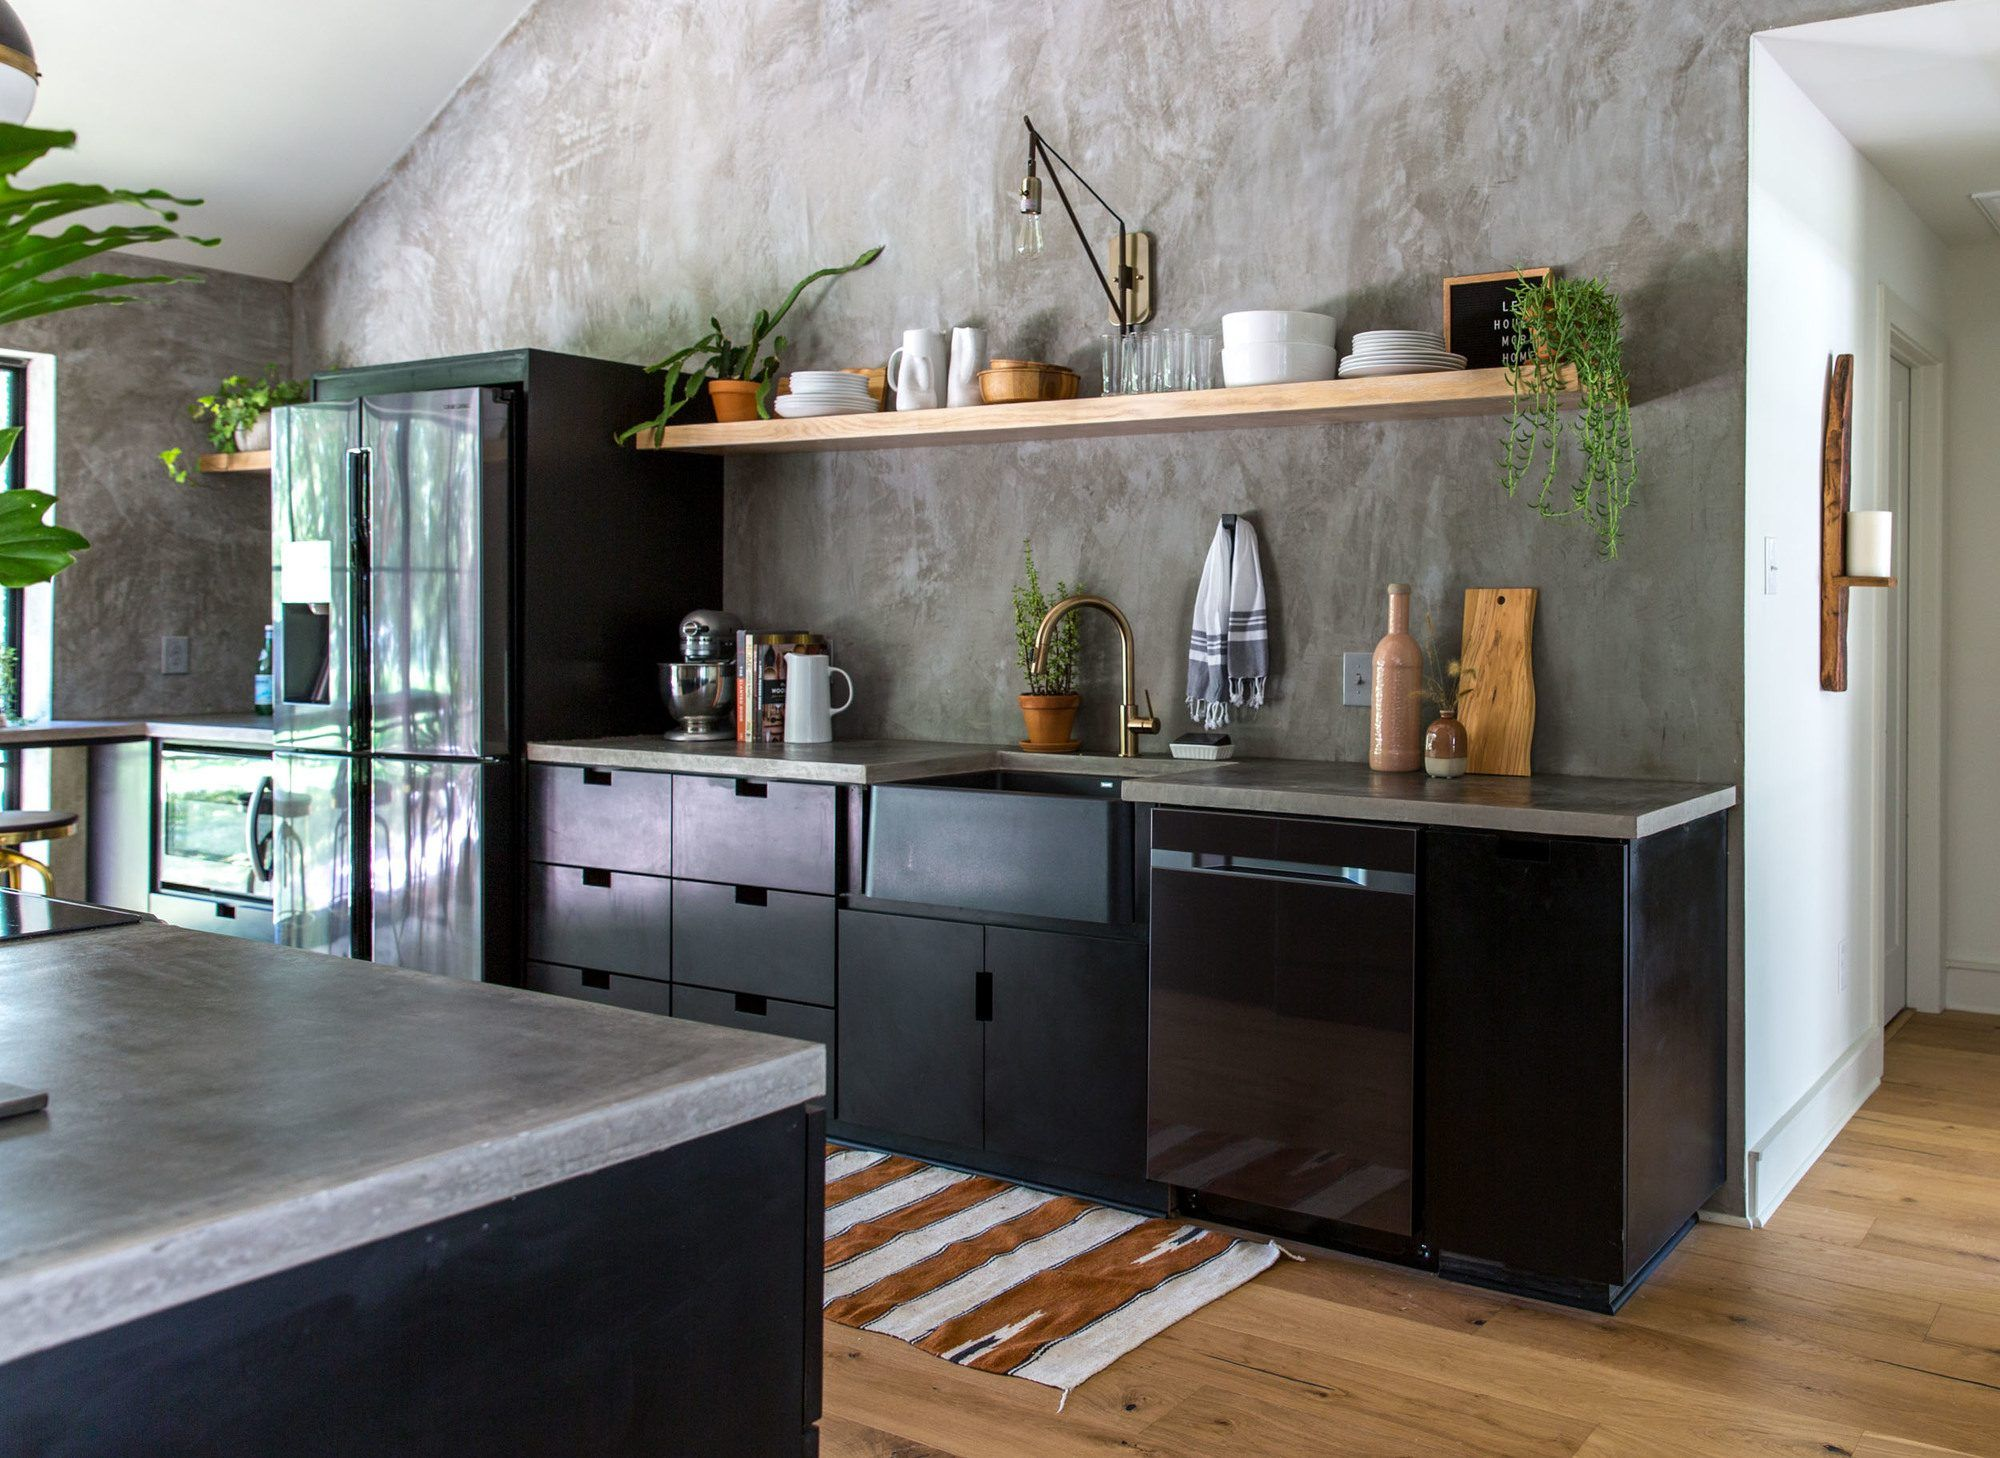 Fixer Upper Homes In 2019 Fixer Upper Kitchen Kitchen House Design